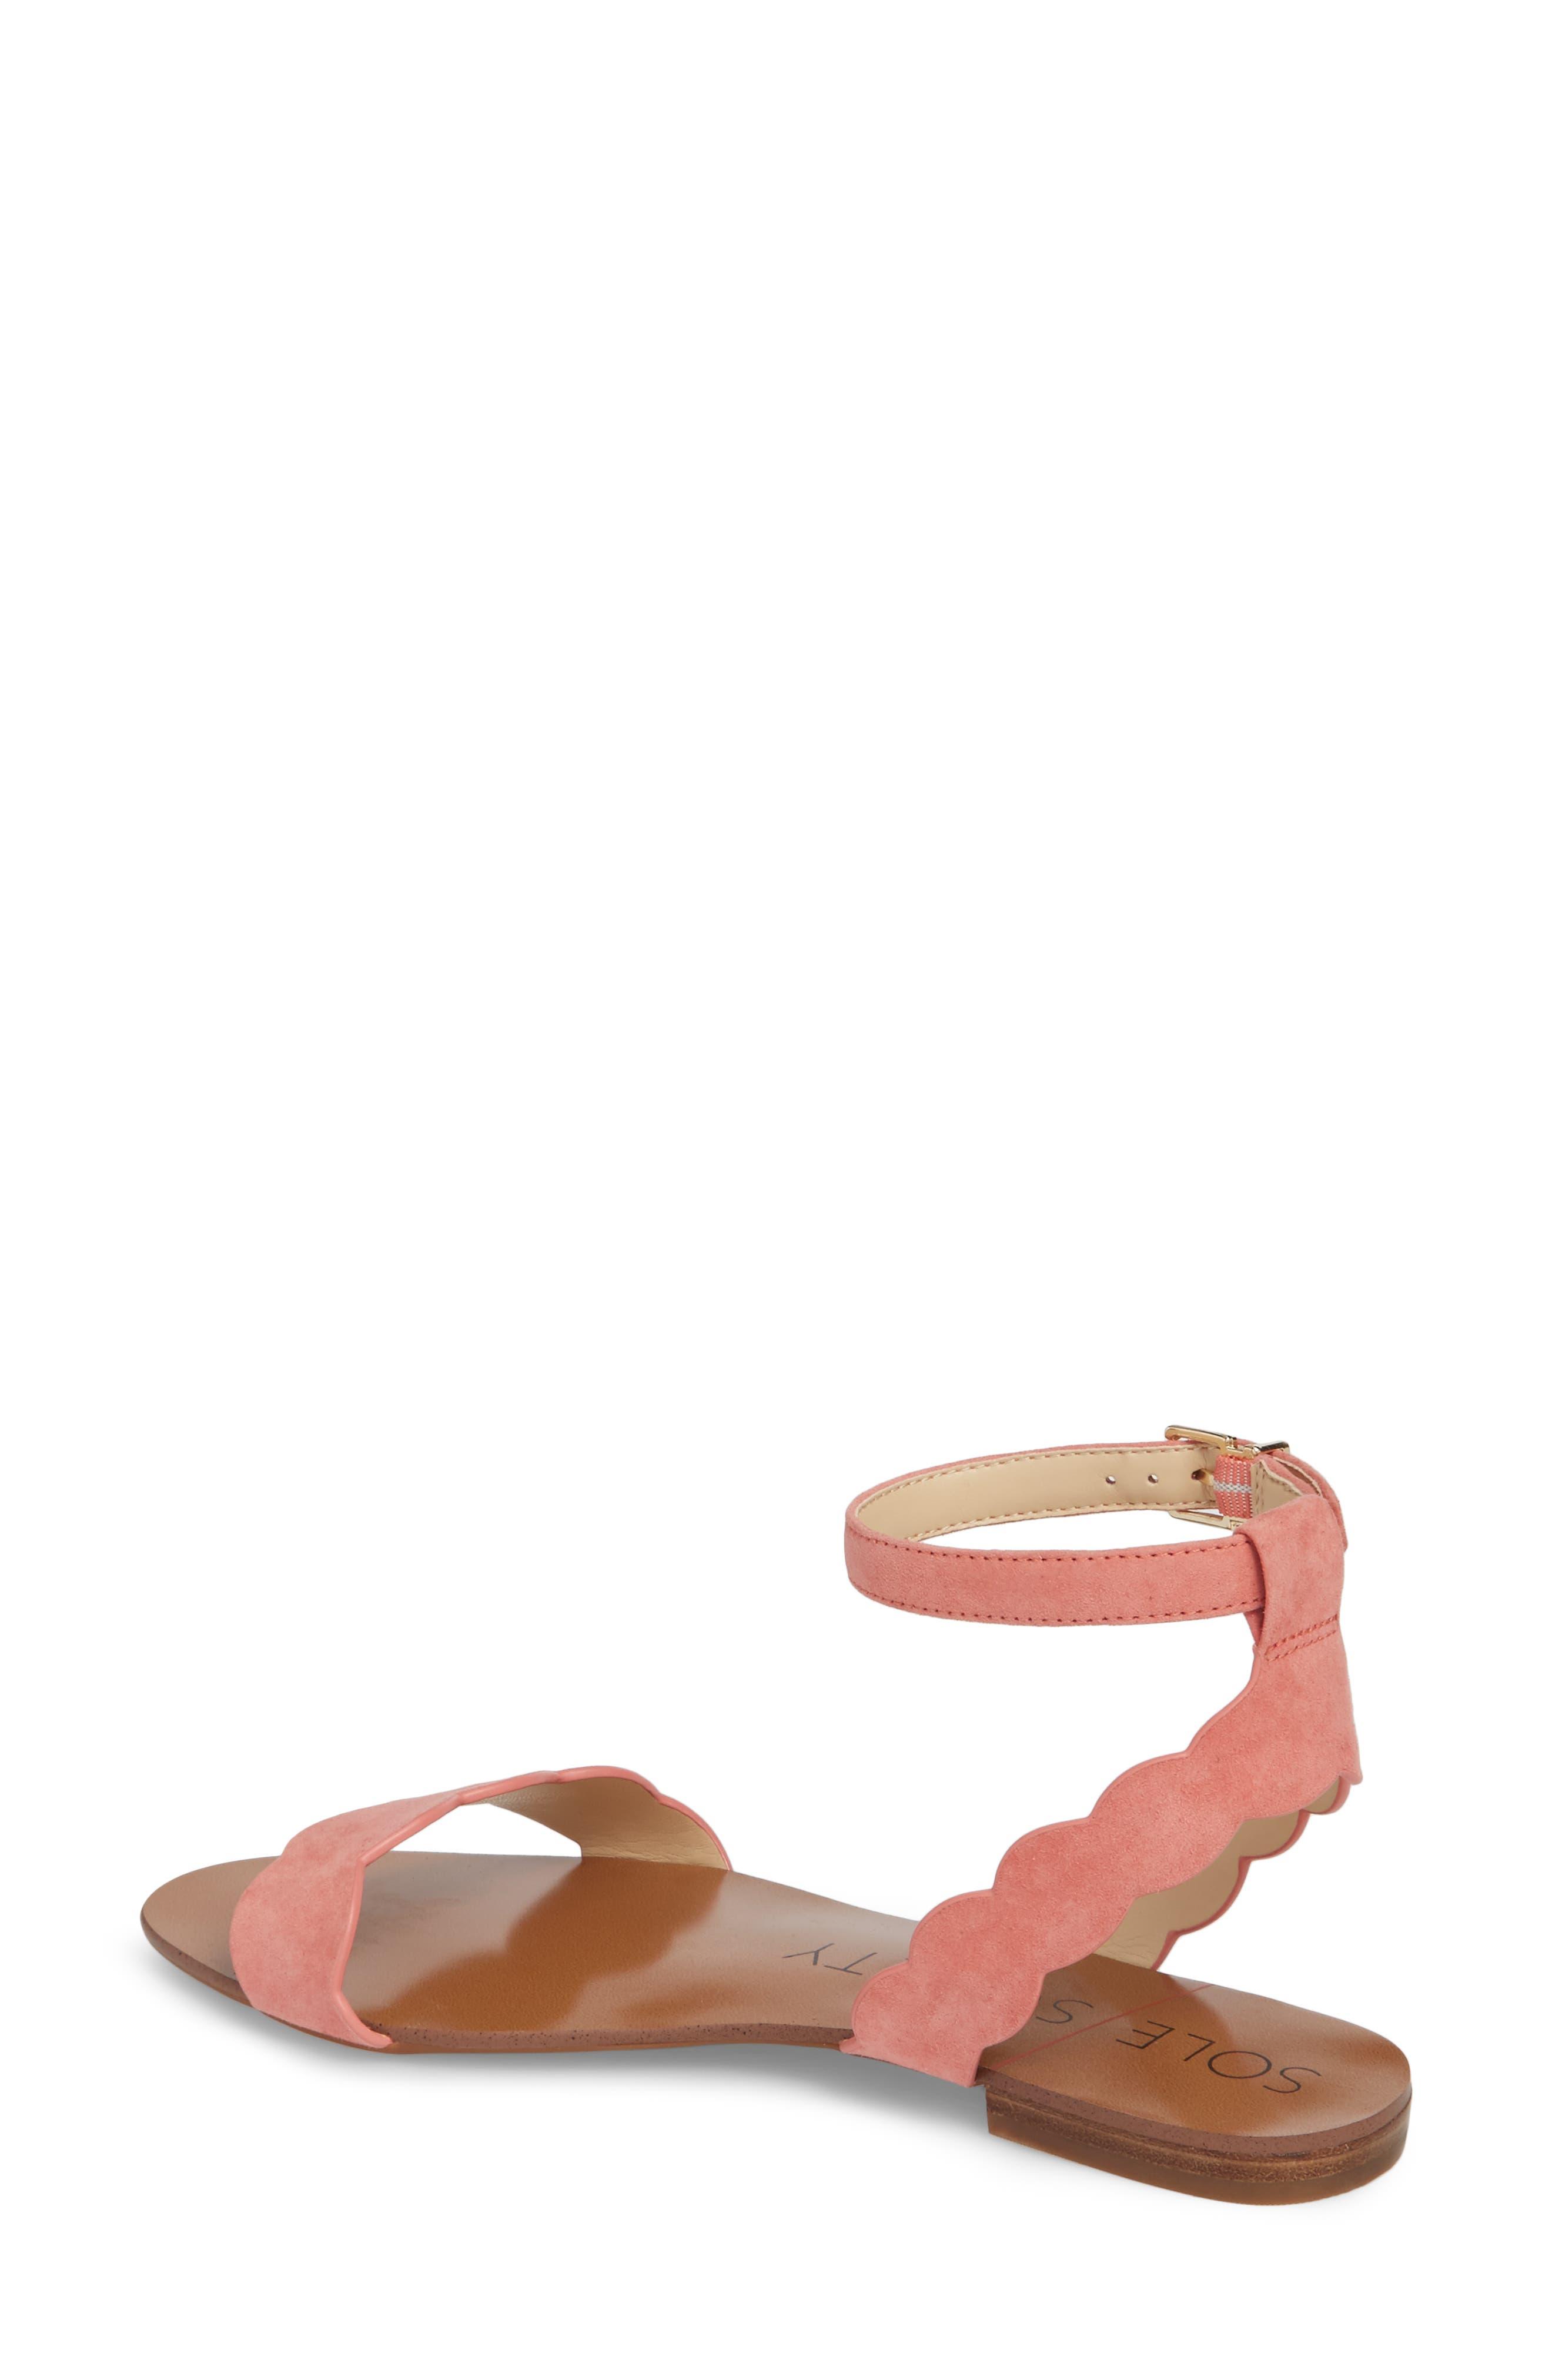 'Odette' Scalloped Ankle Strap Flat Sandal,                             Alternate thumbnail 9, color,